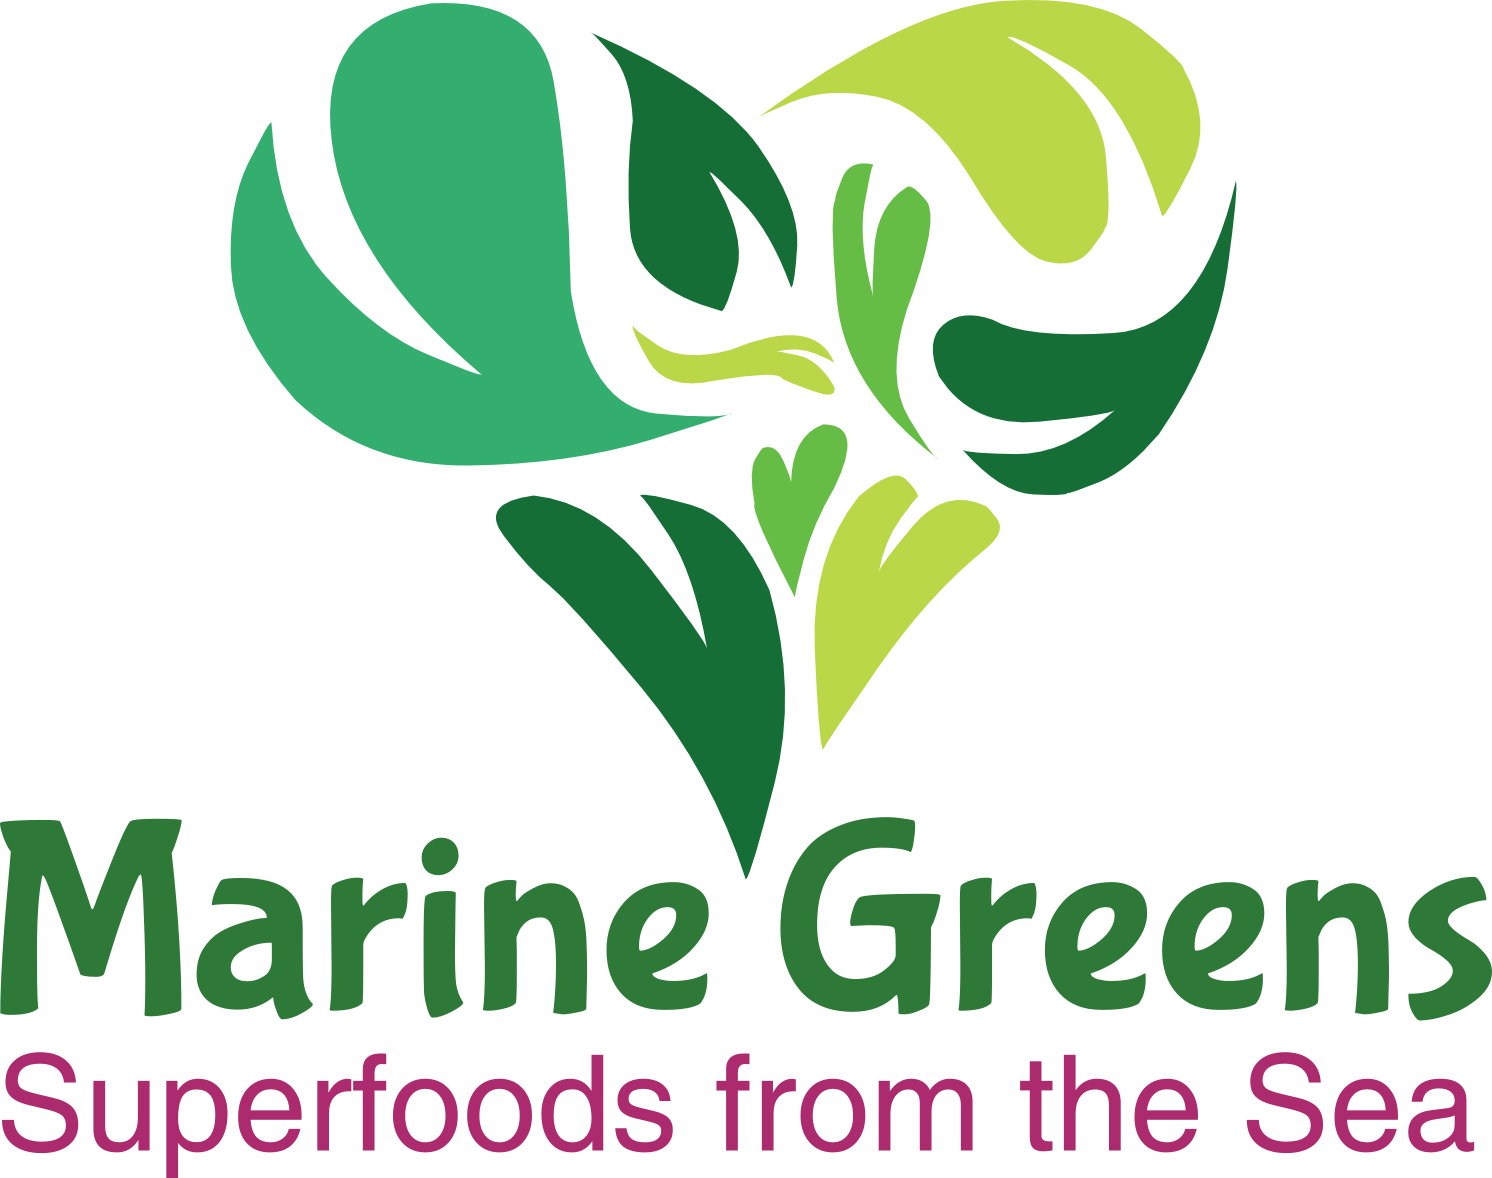 Marine Greens